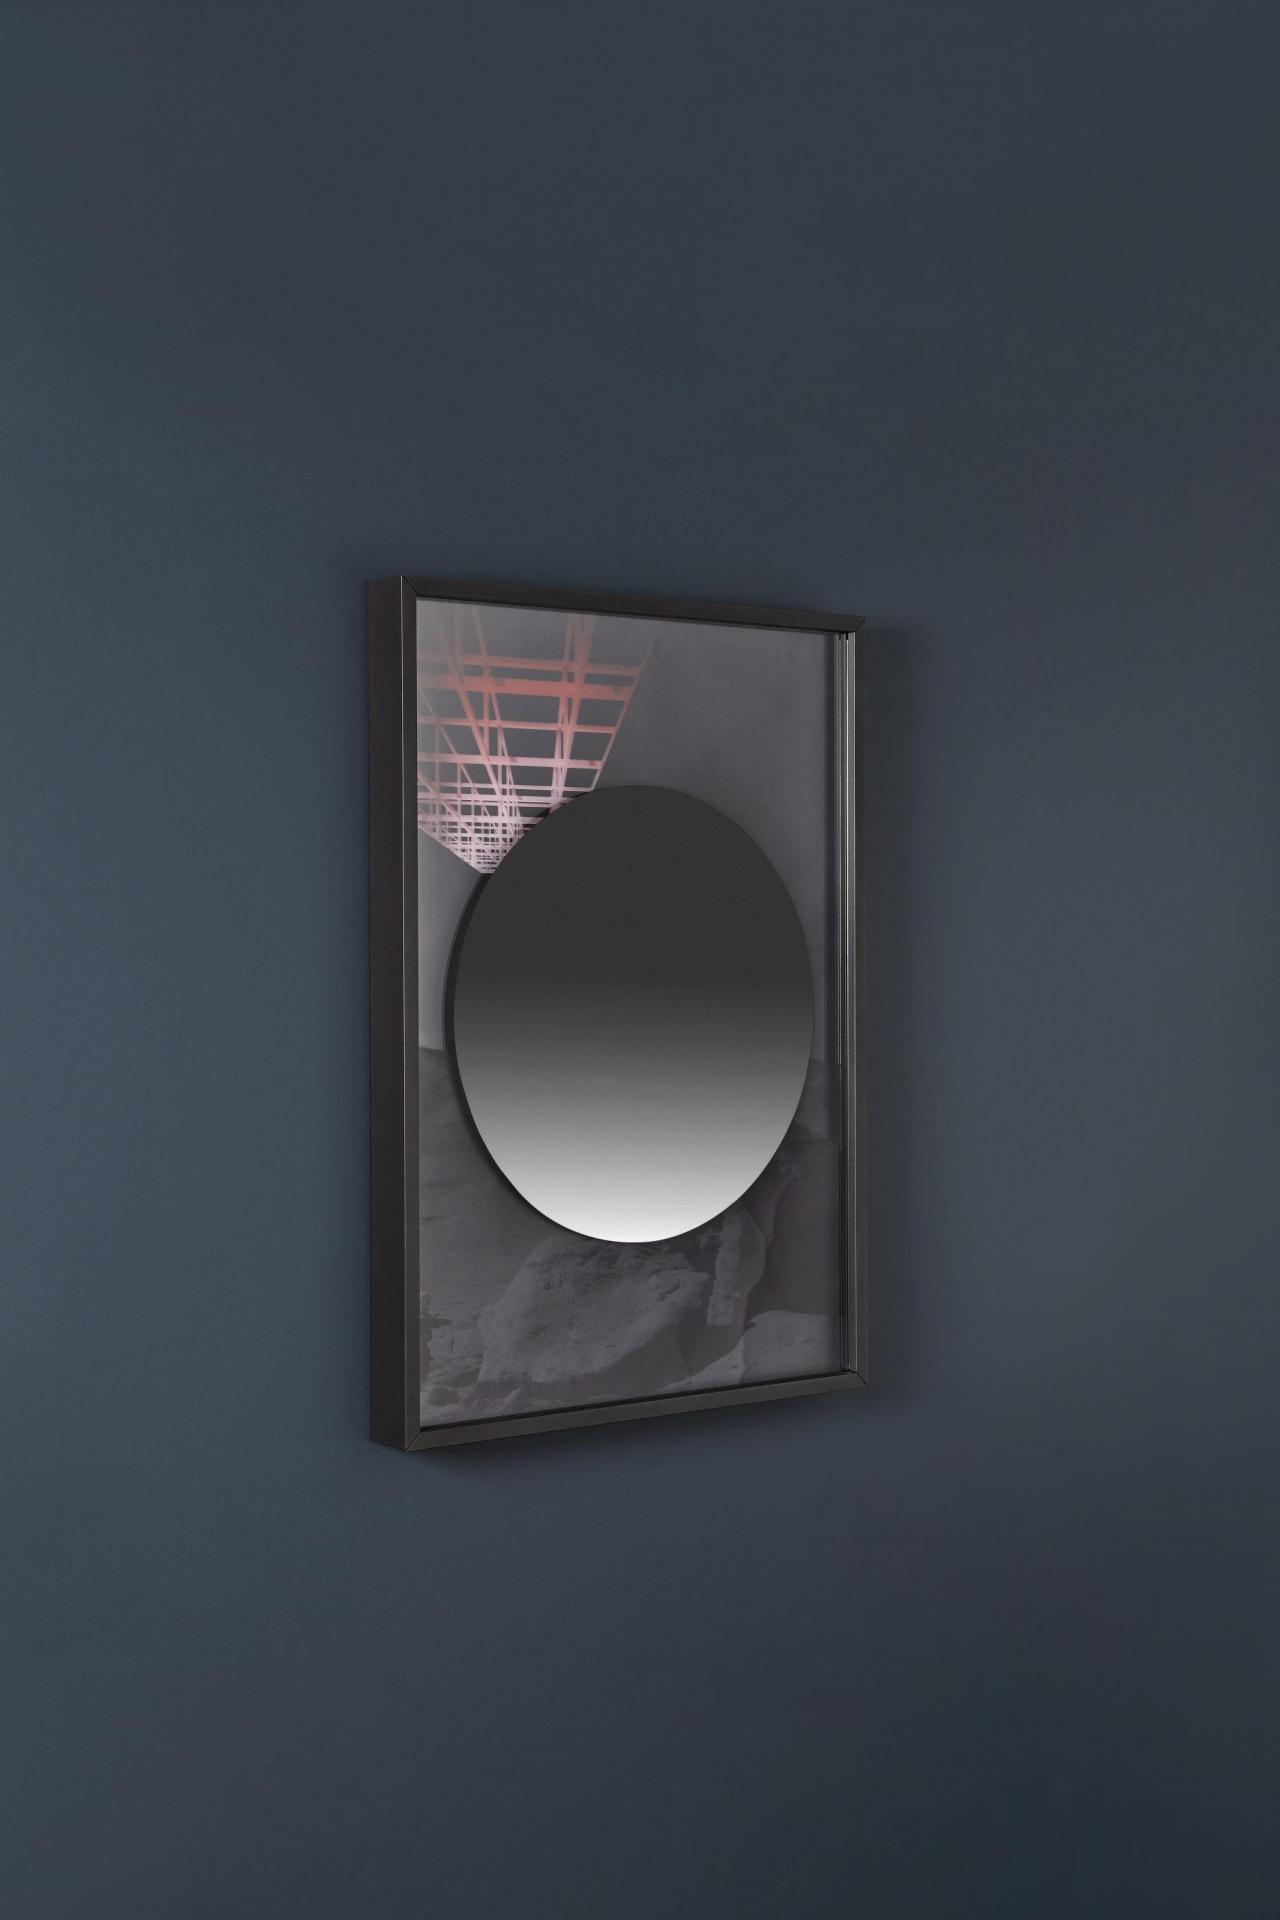 studio-forma-96_antonio-lupi-collage6